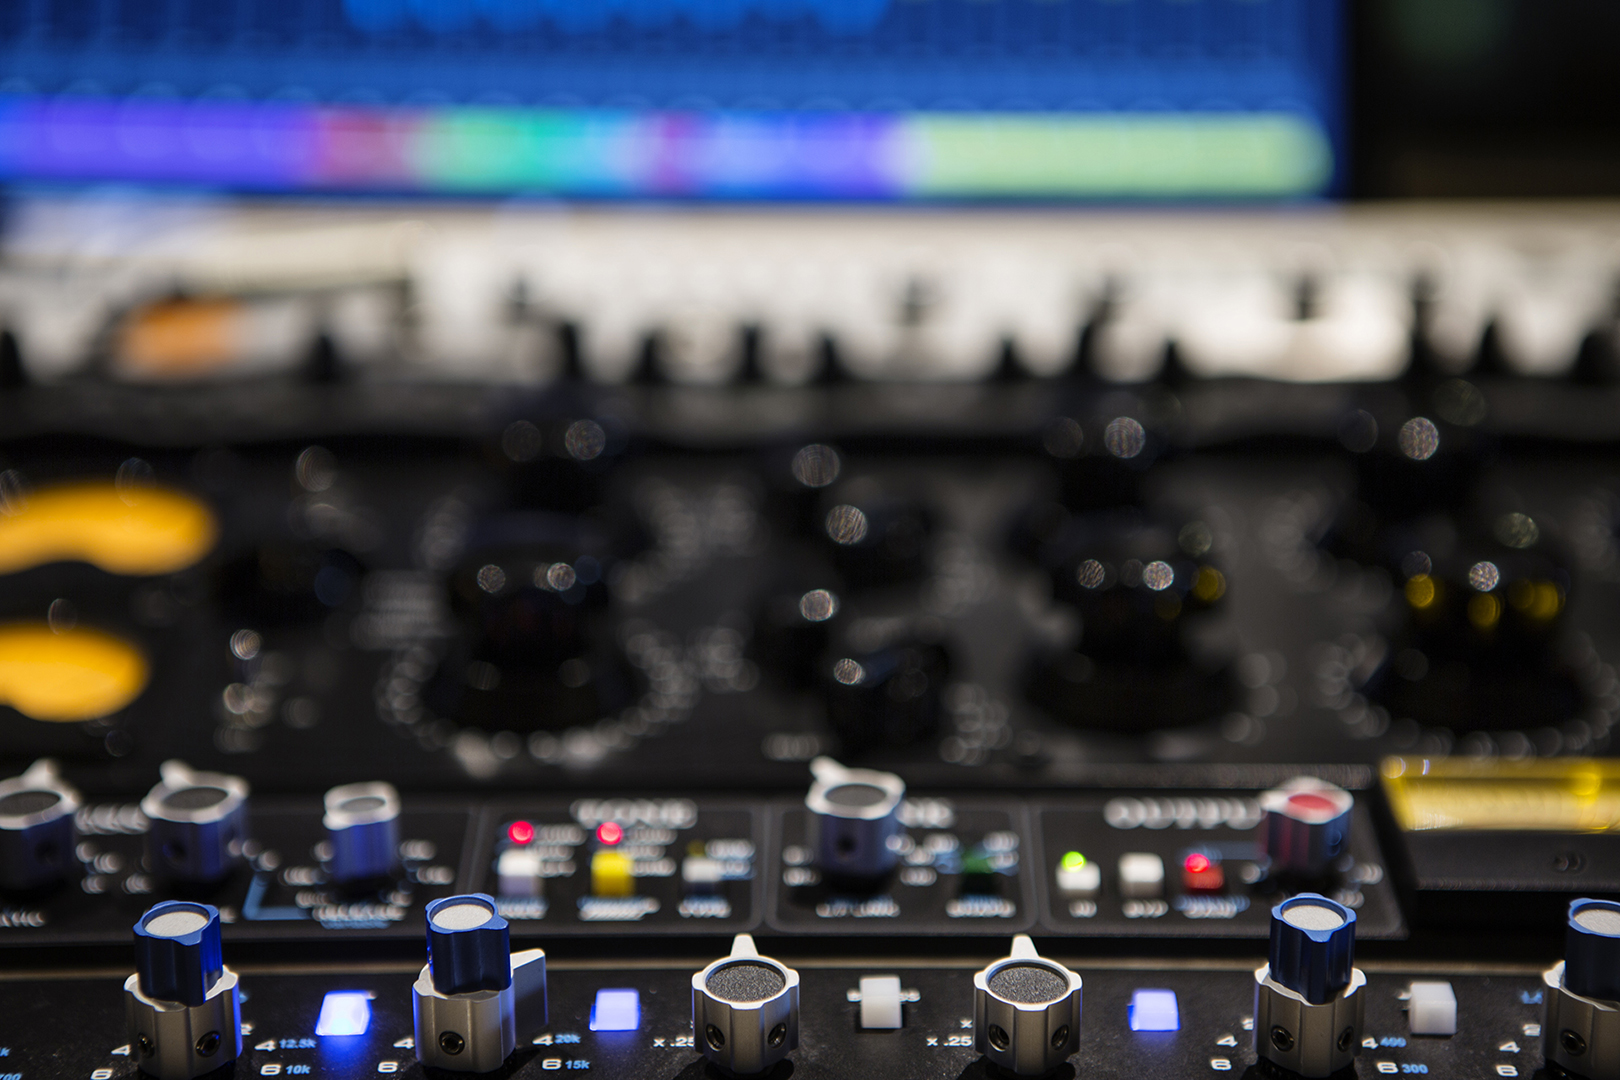 analog mastering gear